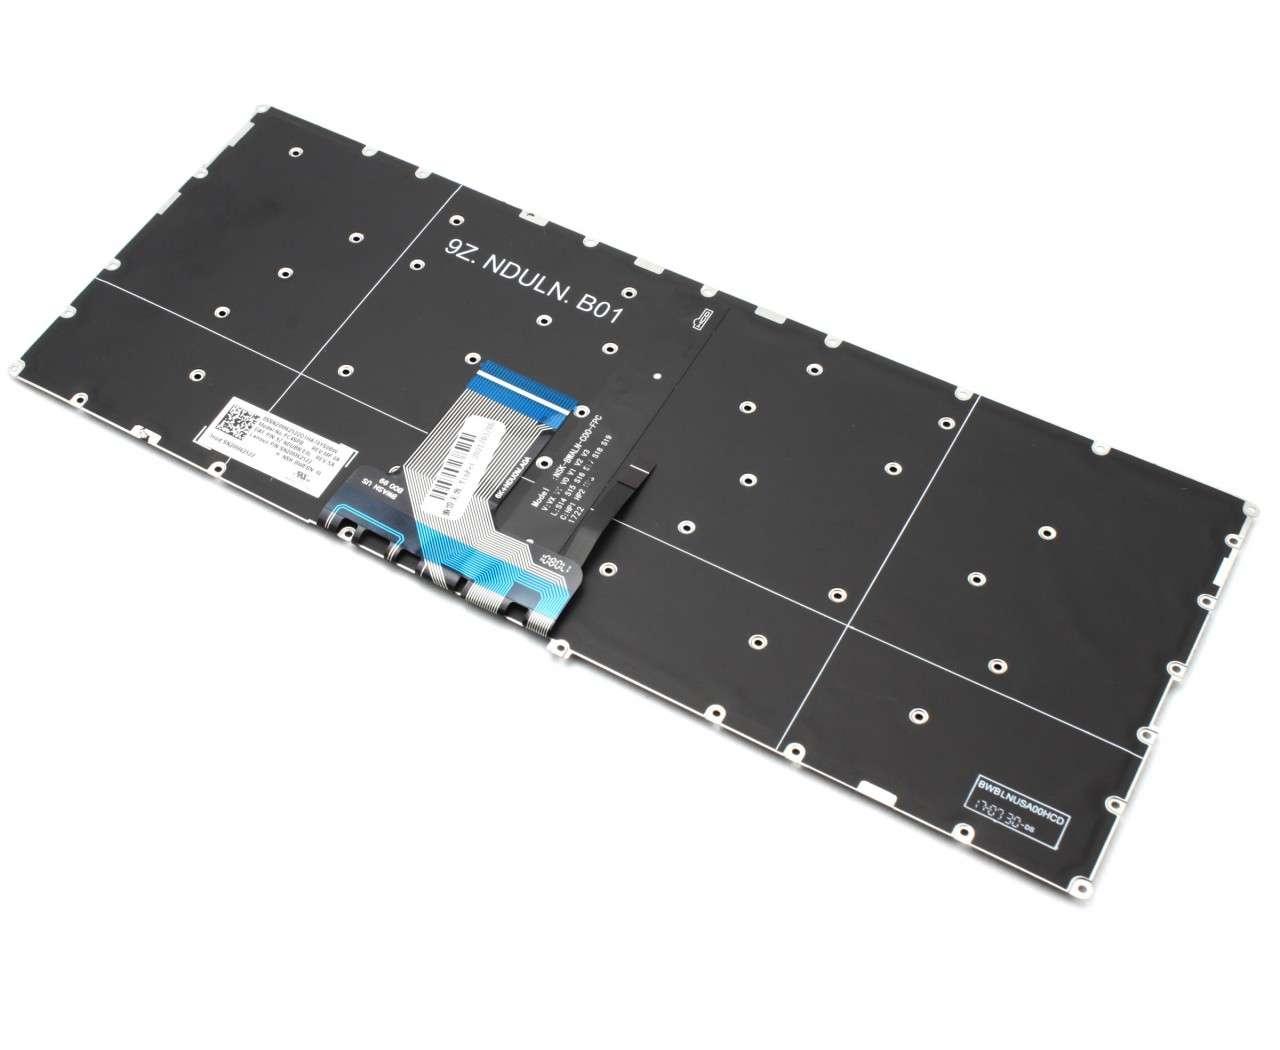 Tastatura Lenovo SN20M62522 iluminata backlit cu Panglica Lunga imagine powerlaptop.ro 2021